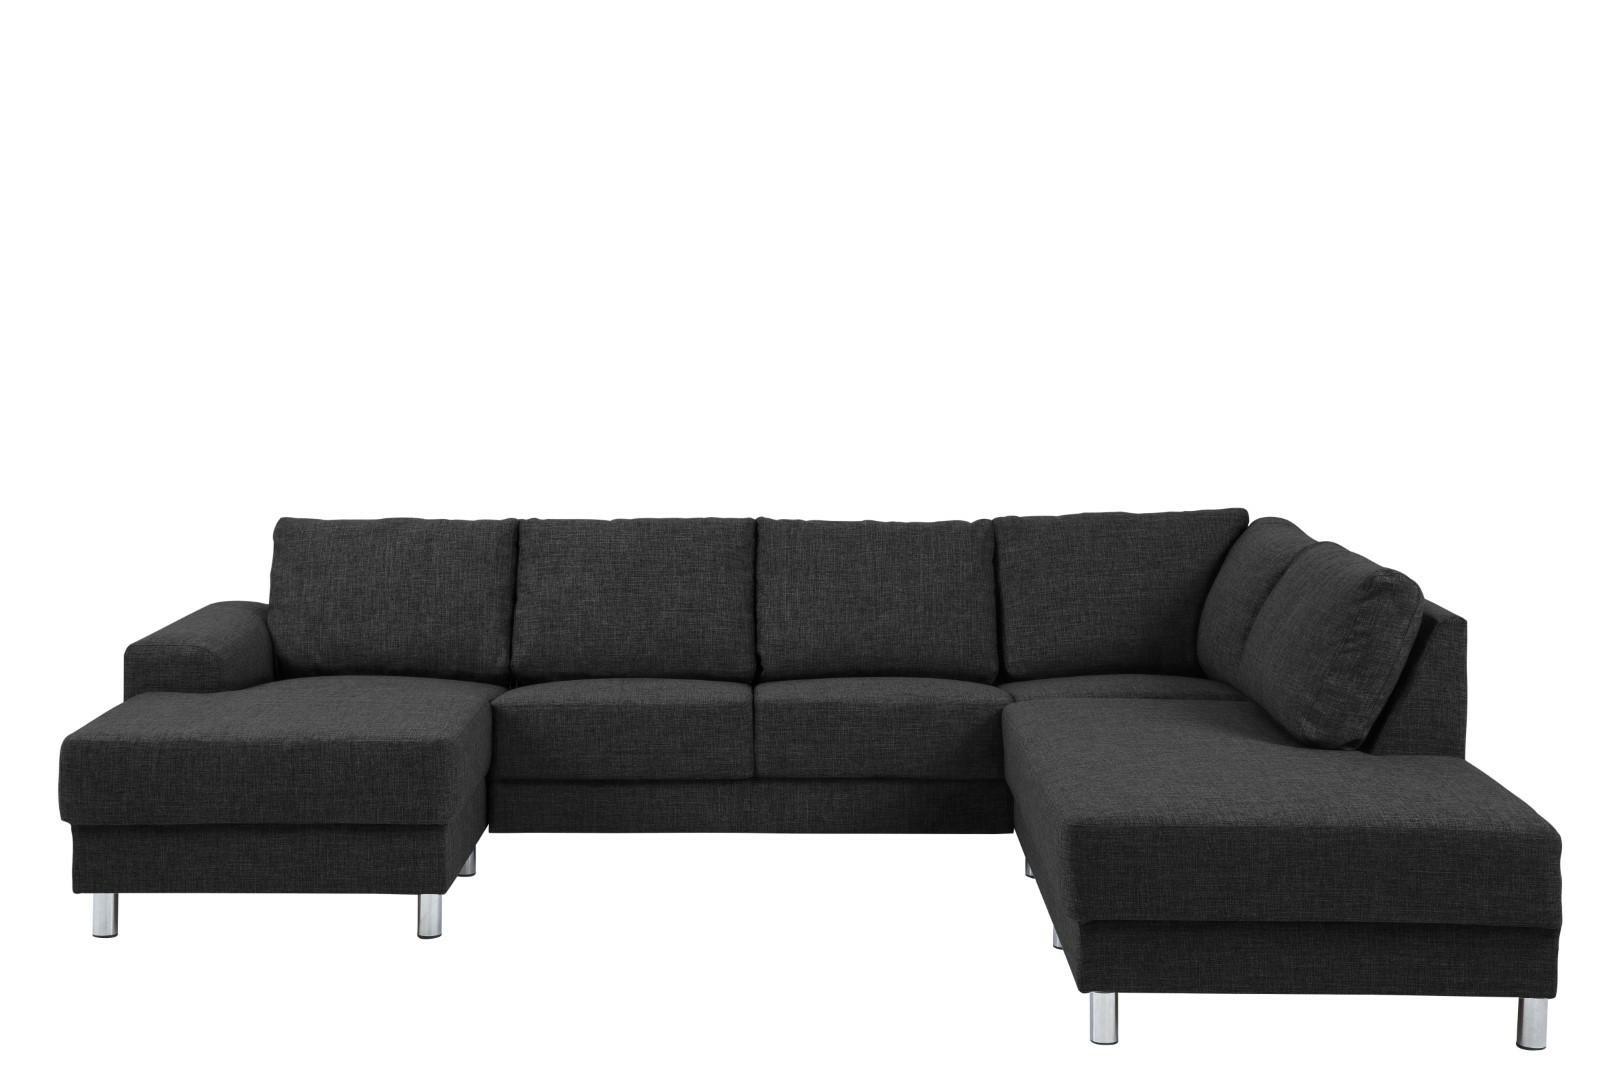 Narożna sofa Calverton Antracyt prawa - zdjęcie nr 0